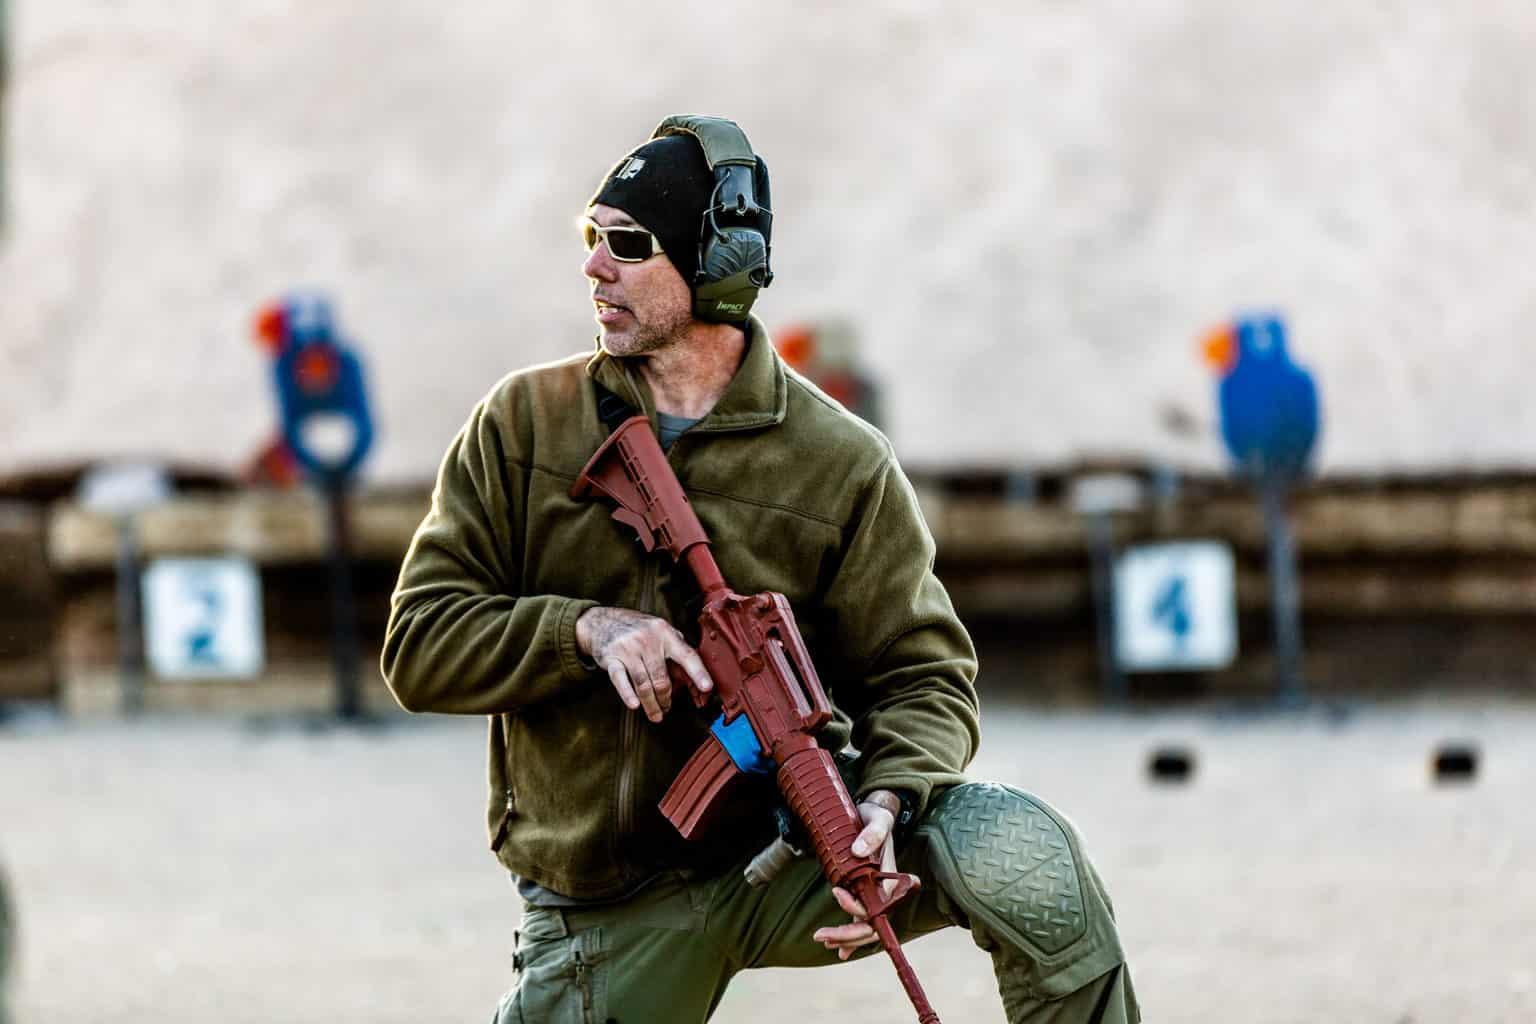 Civilian Firearm Courses in Arizona